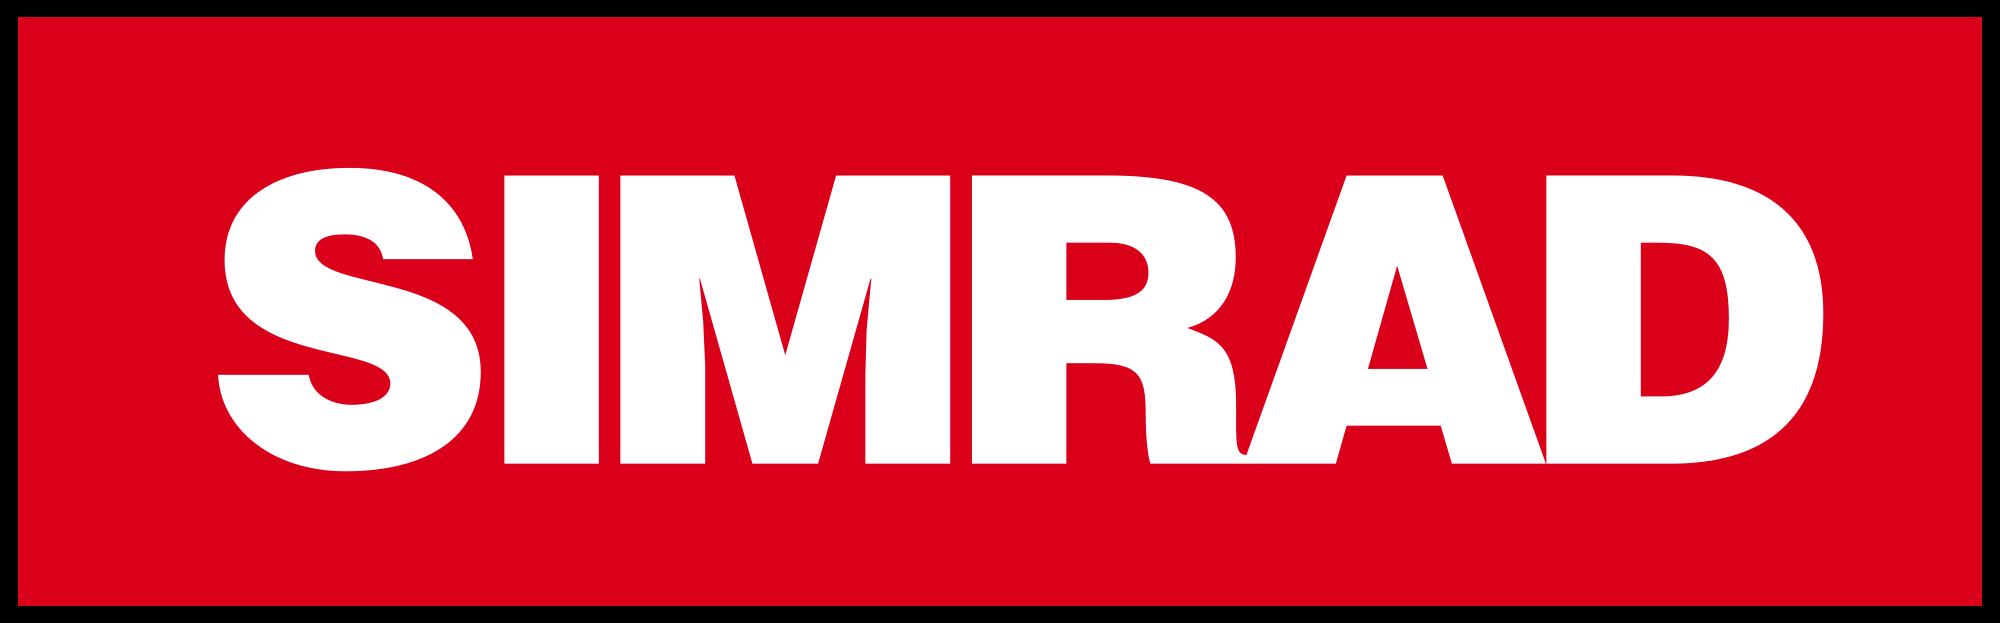 https://technicalmarine.com/wp-content/uploads/2019/04/Simrad-logo-1.png